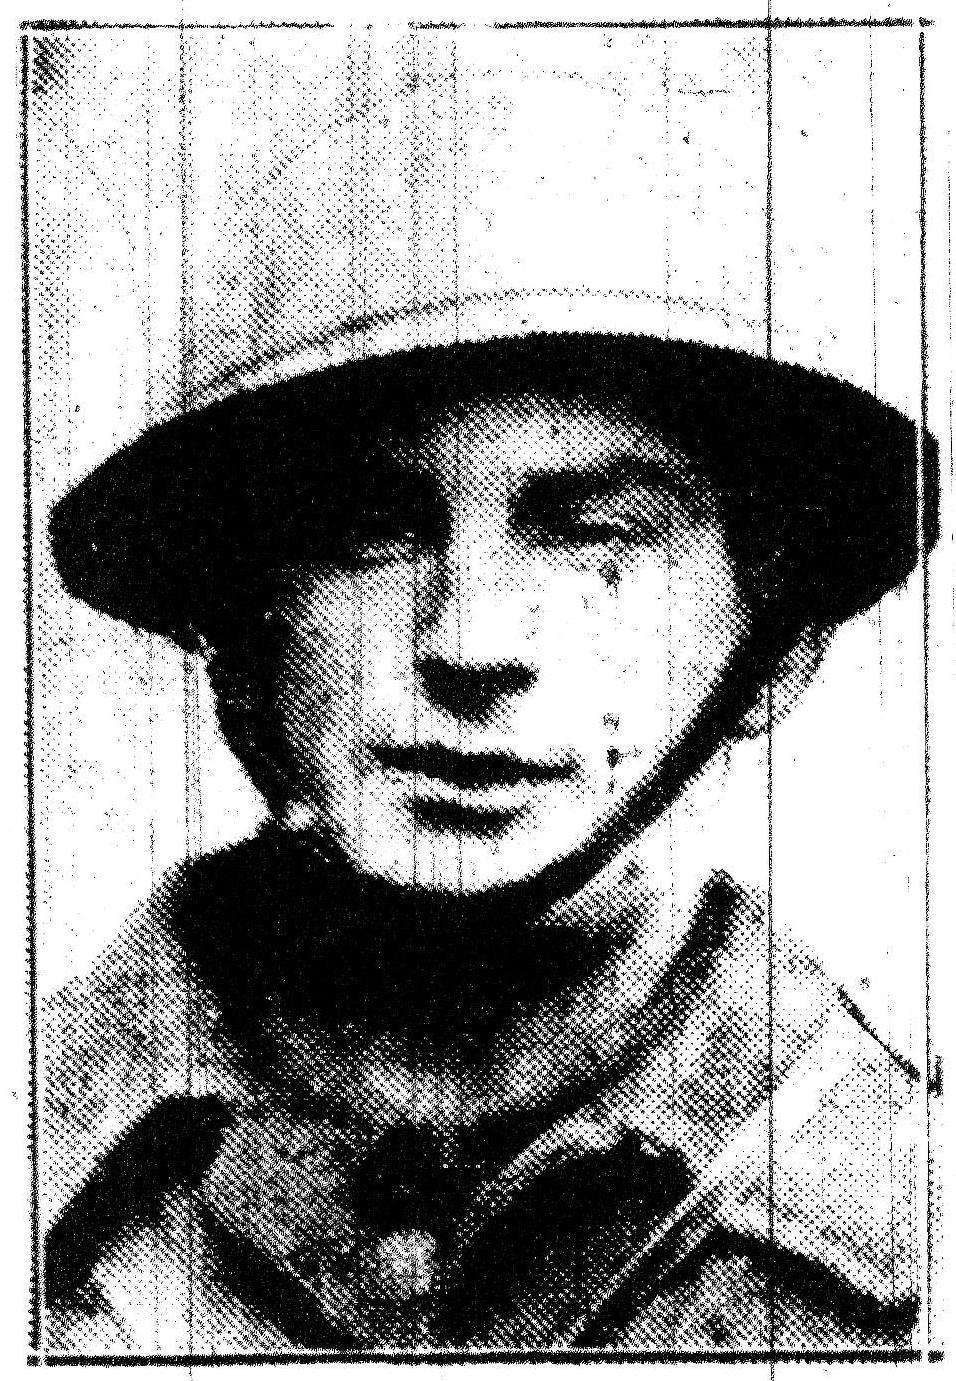 Private Benjamin Thomas Whymark